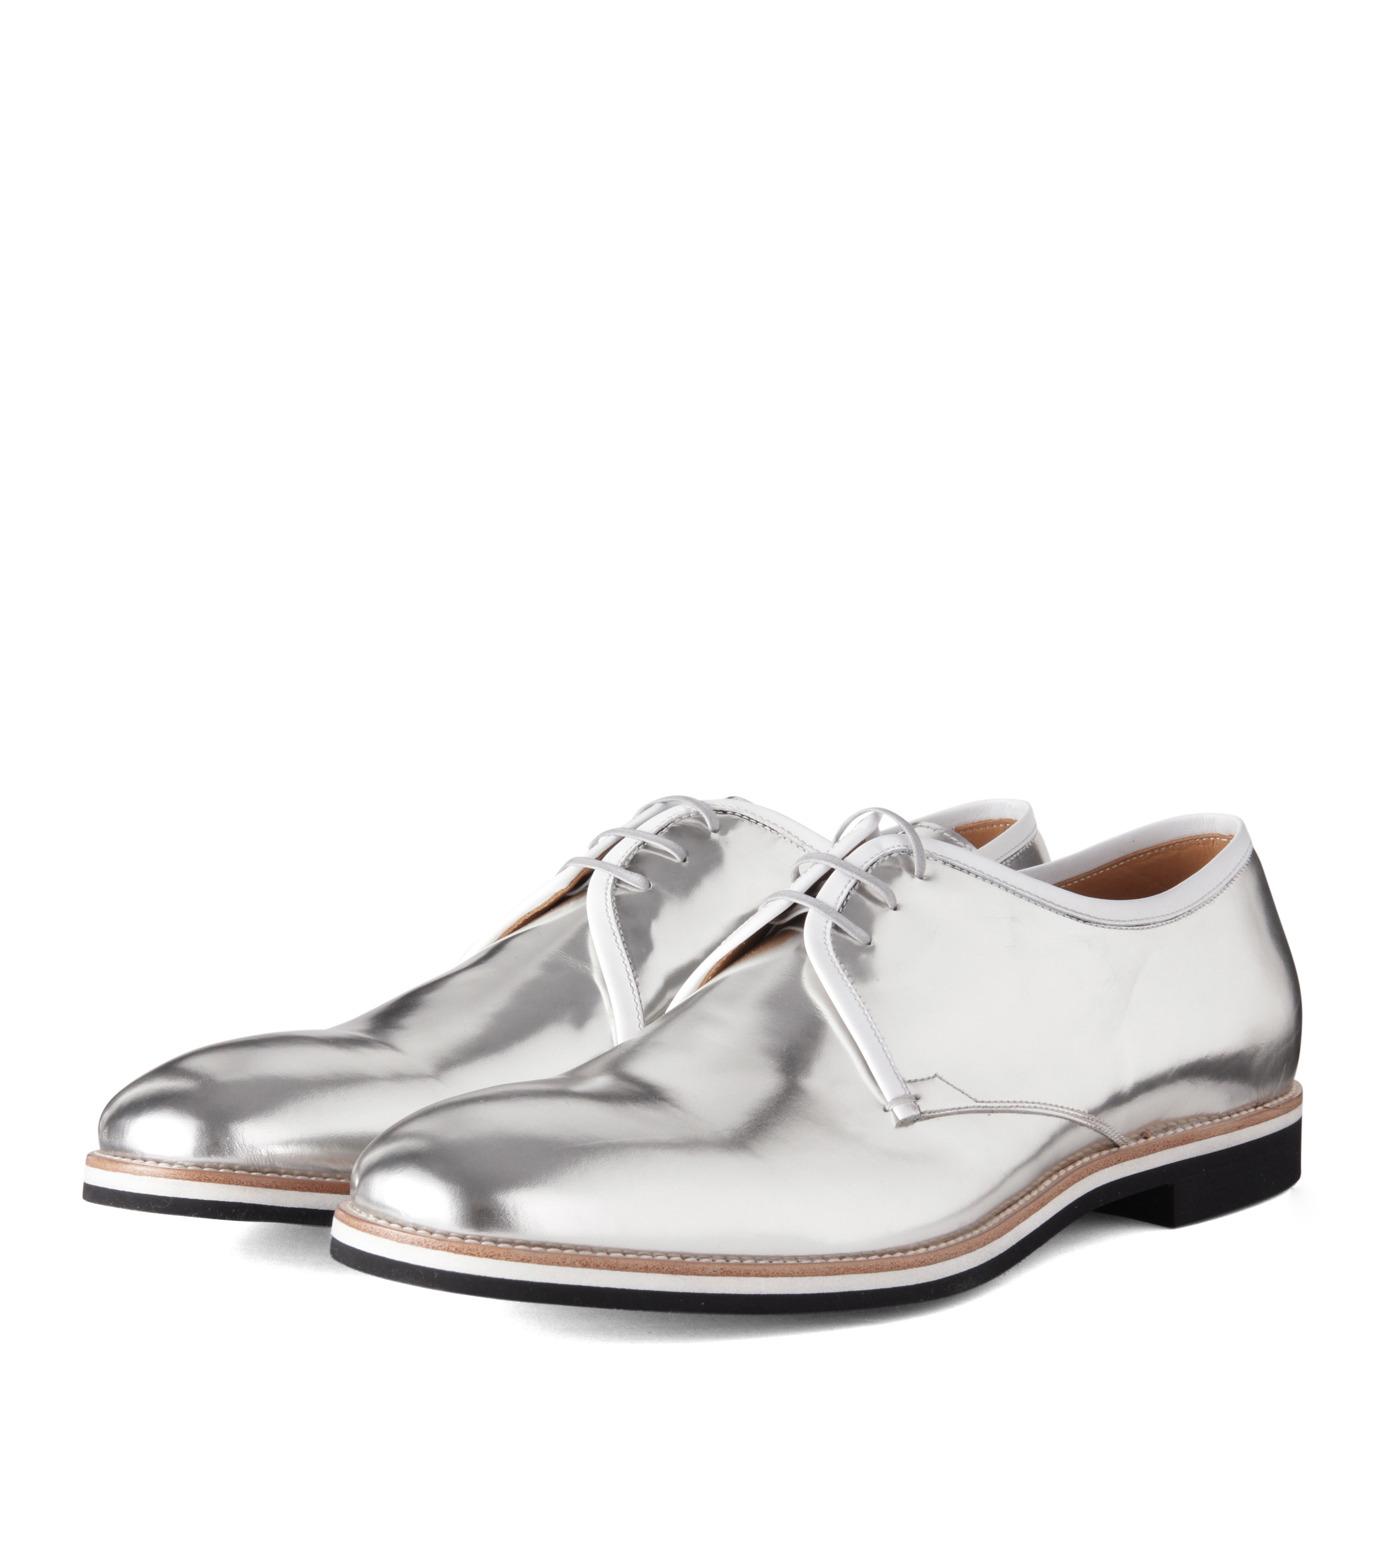 Sergio Rossi(セルジオ ロッシ)のDerby-SILVER(シューズ/shoes)-A61190-1 拡大詳細画像4